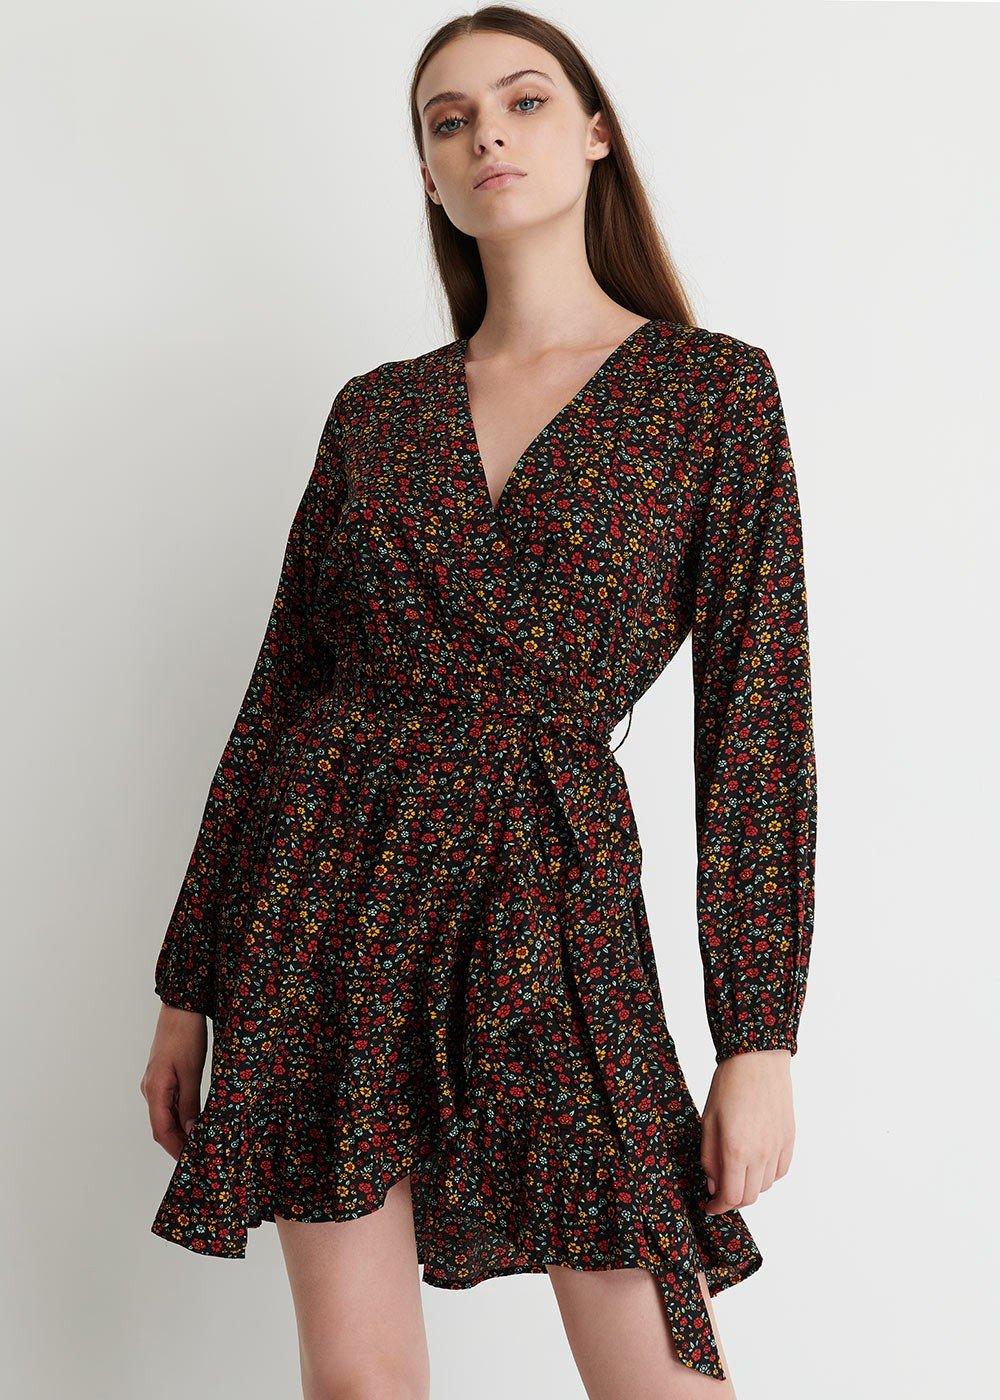 Adriel Midi dress with floral print - Black/Tango/Fantasia - Woman